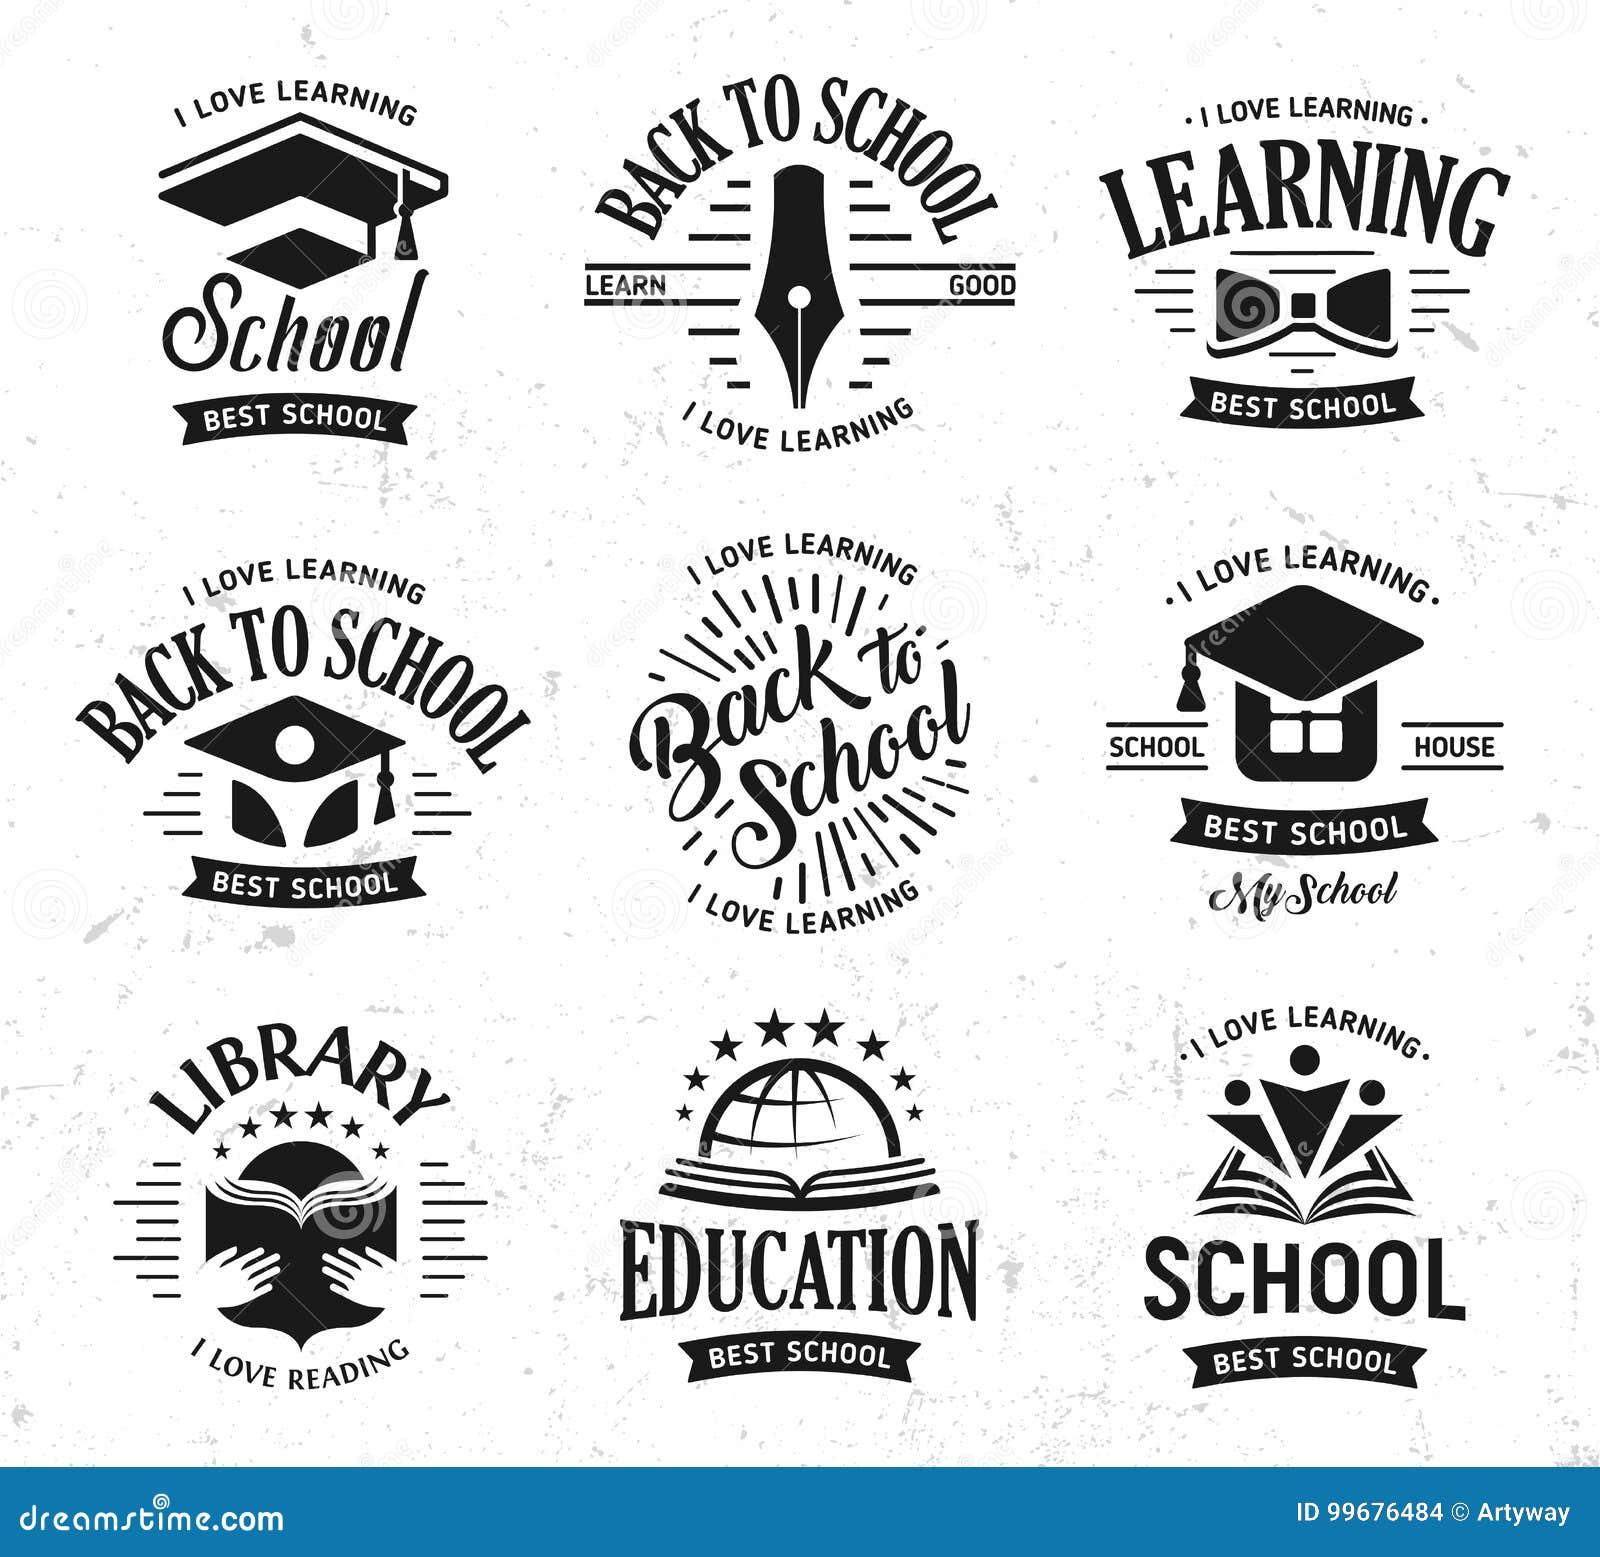 School vector logos set, monochrome vintage design education signs. Back to school, university, college, learning logo